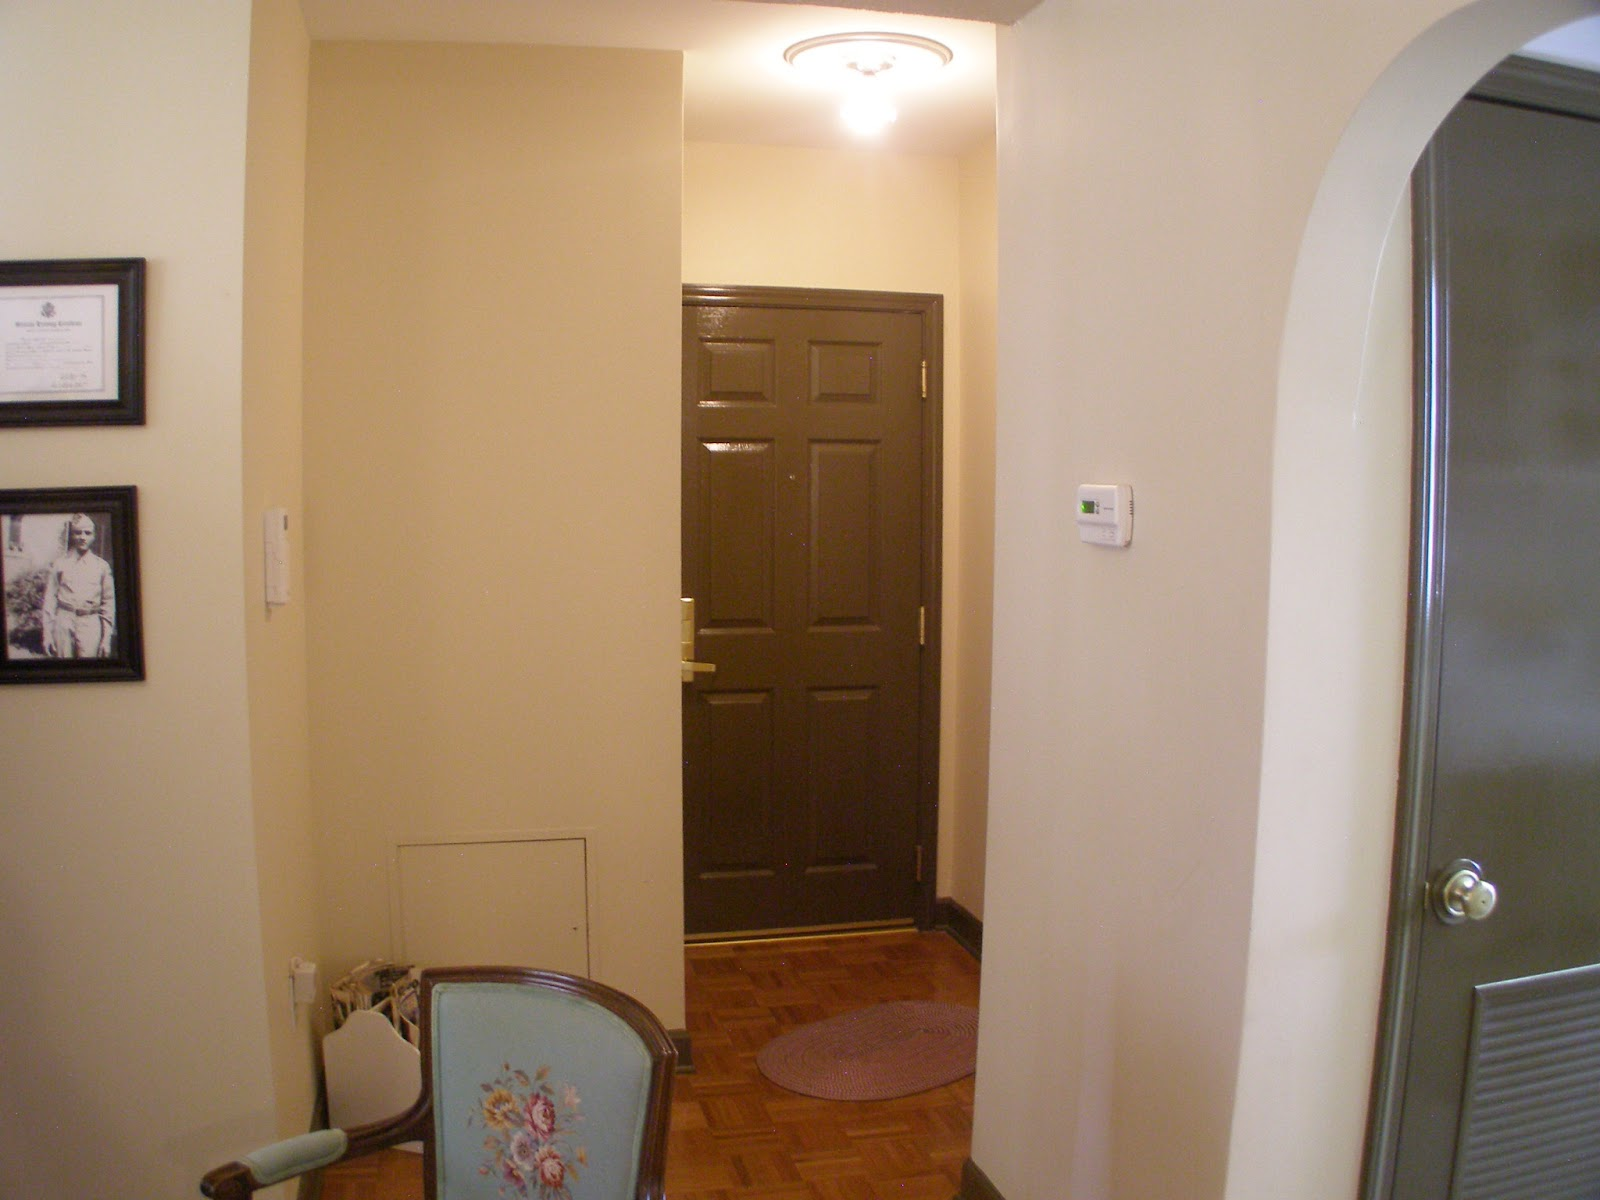 Apartment Door Design   Table and Chair and Door